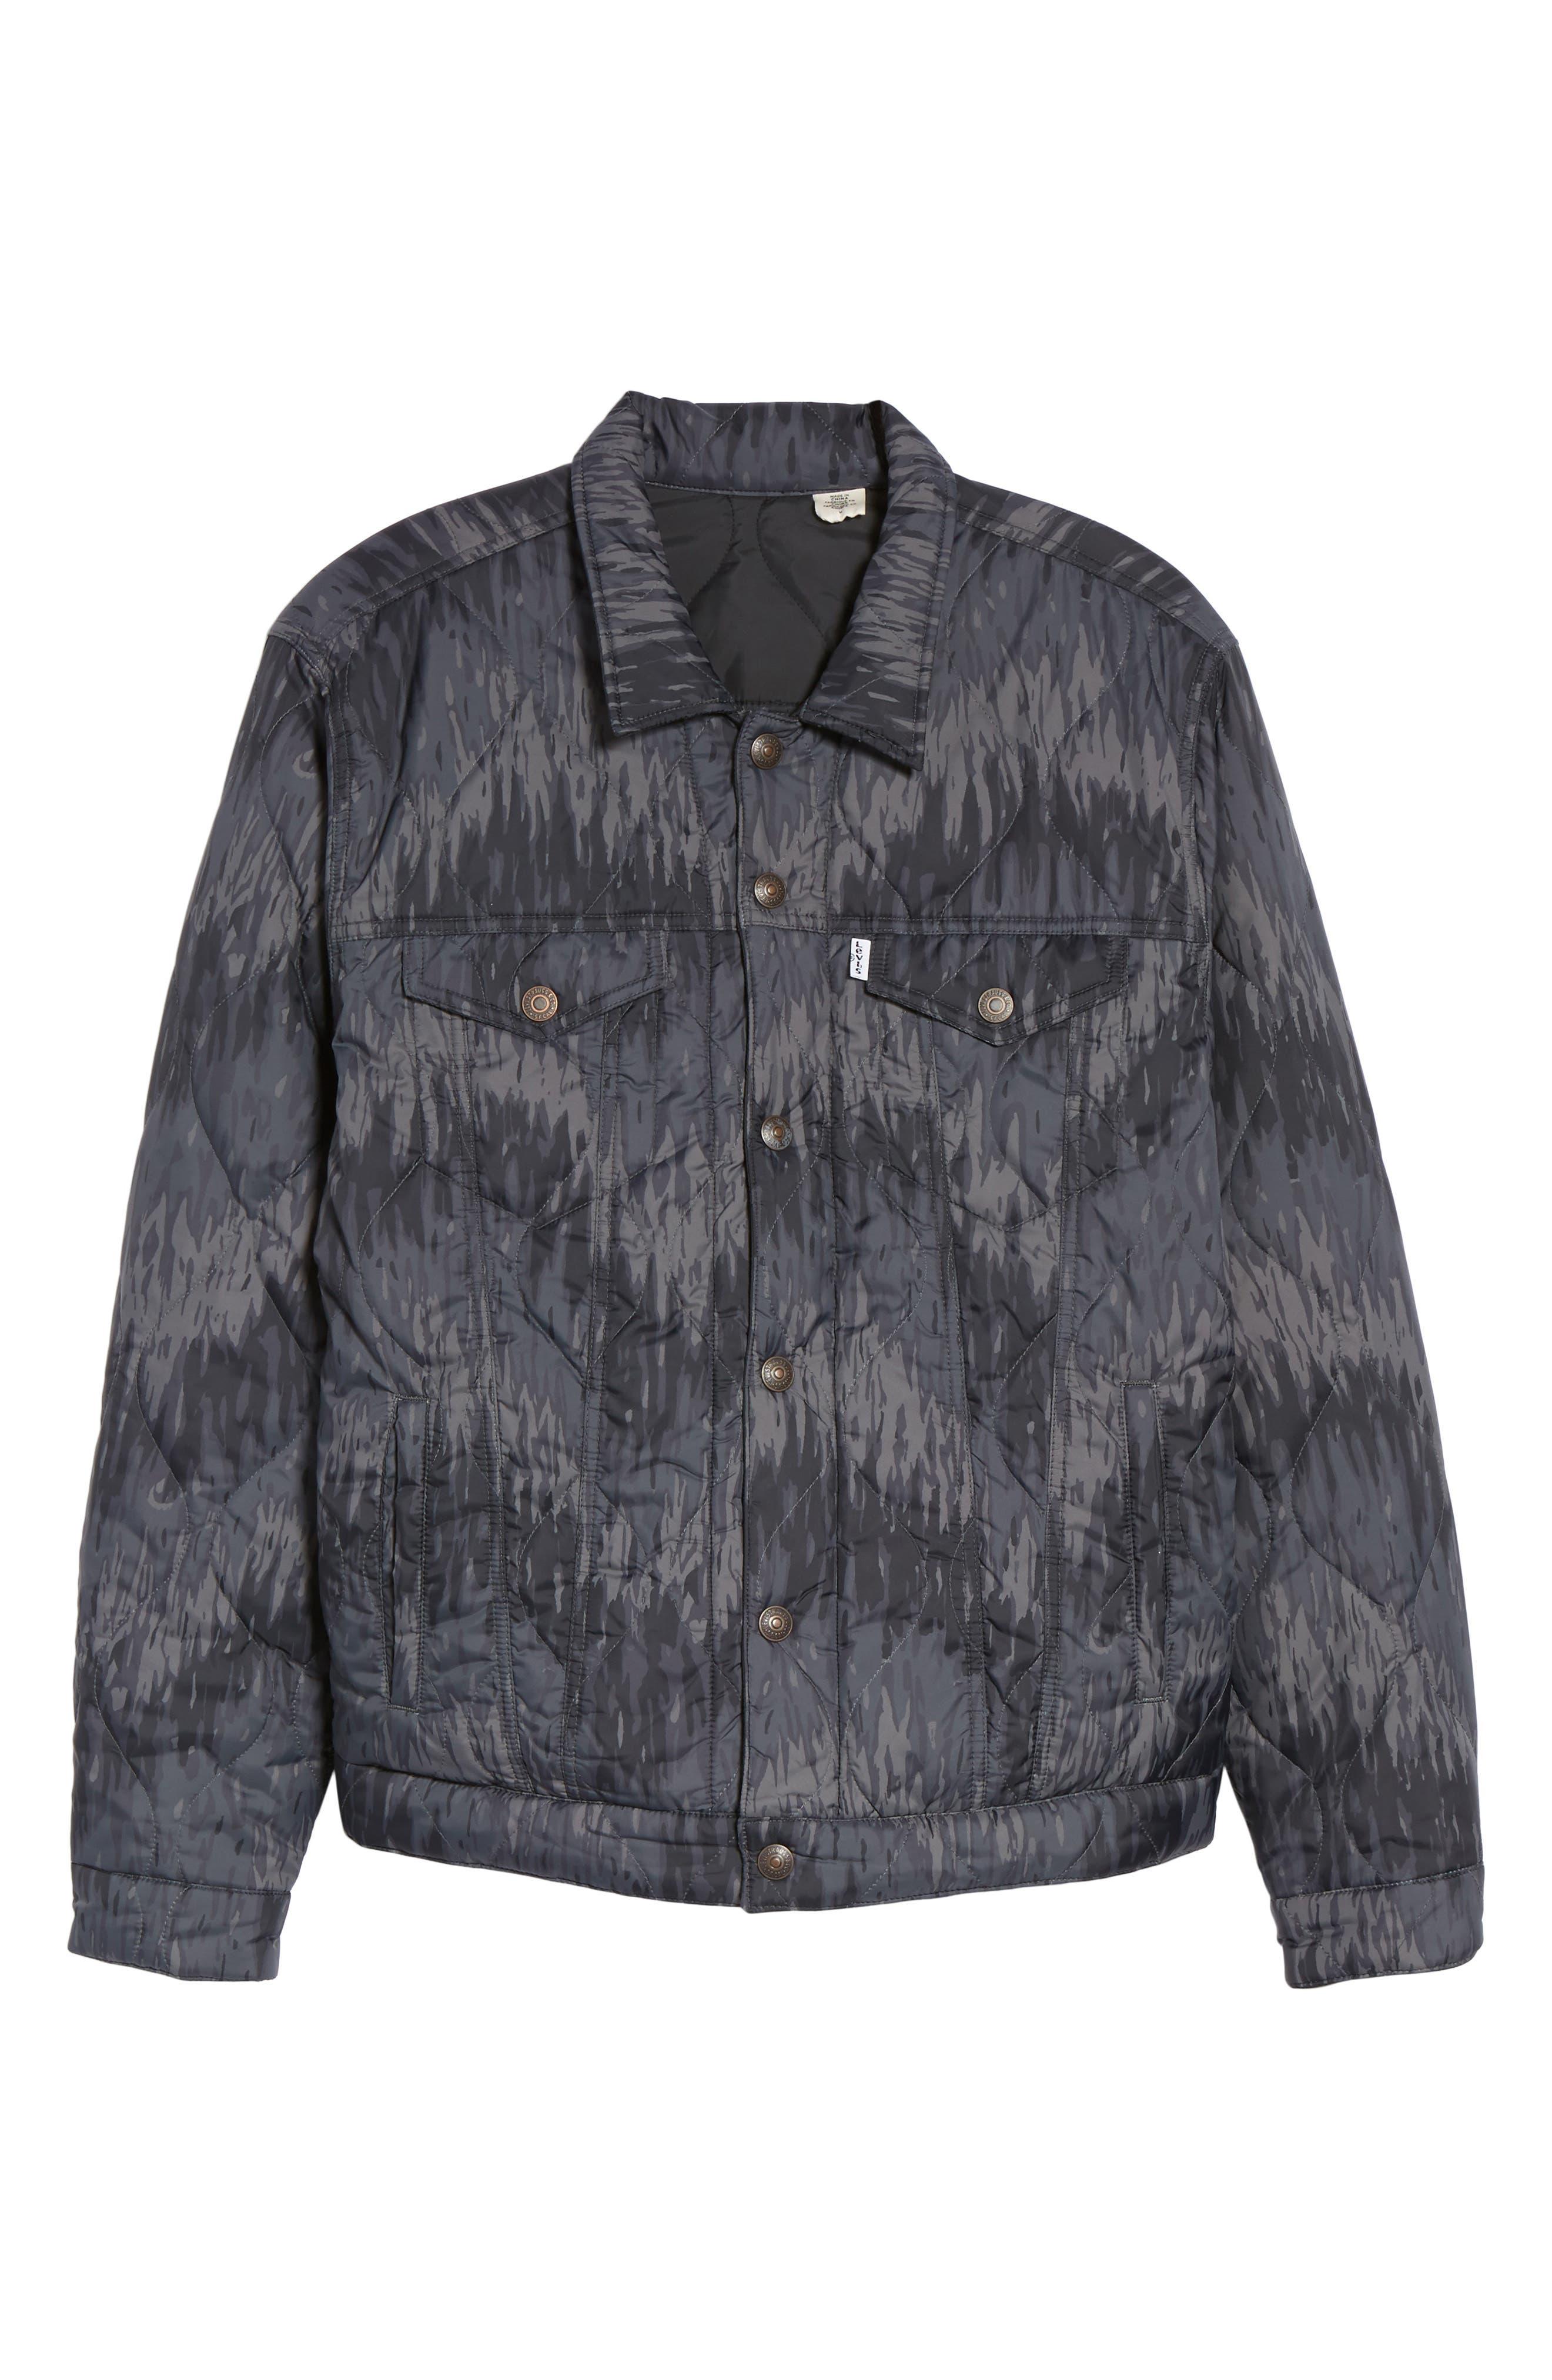 'Barstow' Denim Western Shirt,                             Alternate thumbnail 32, color,